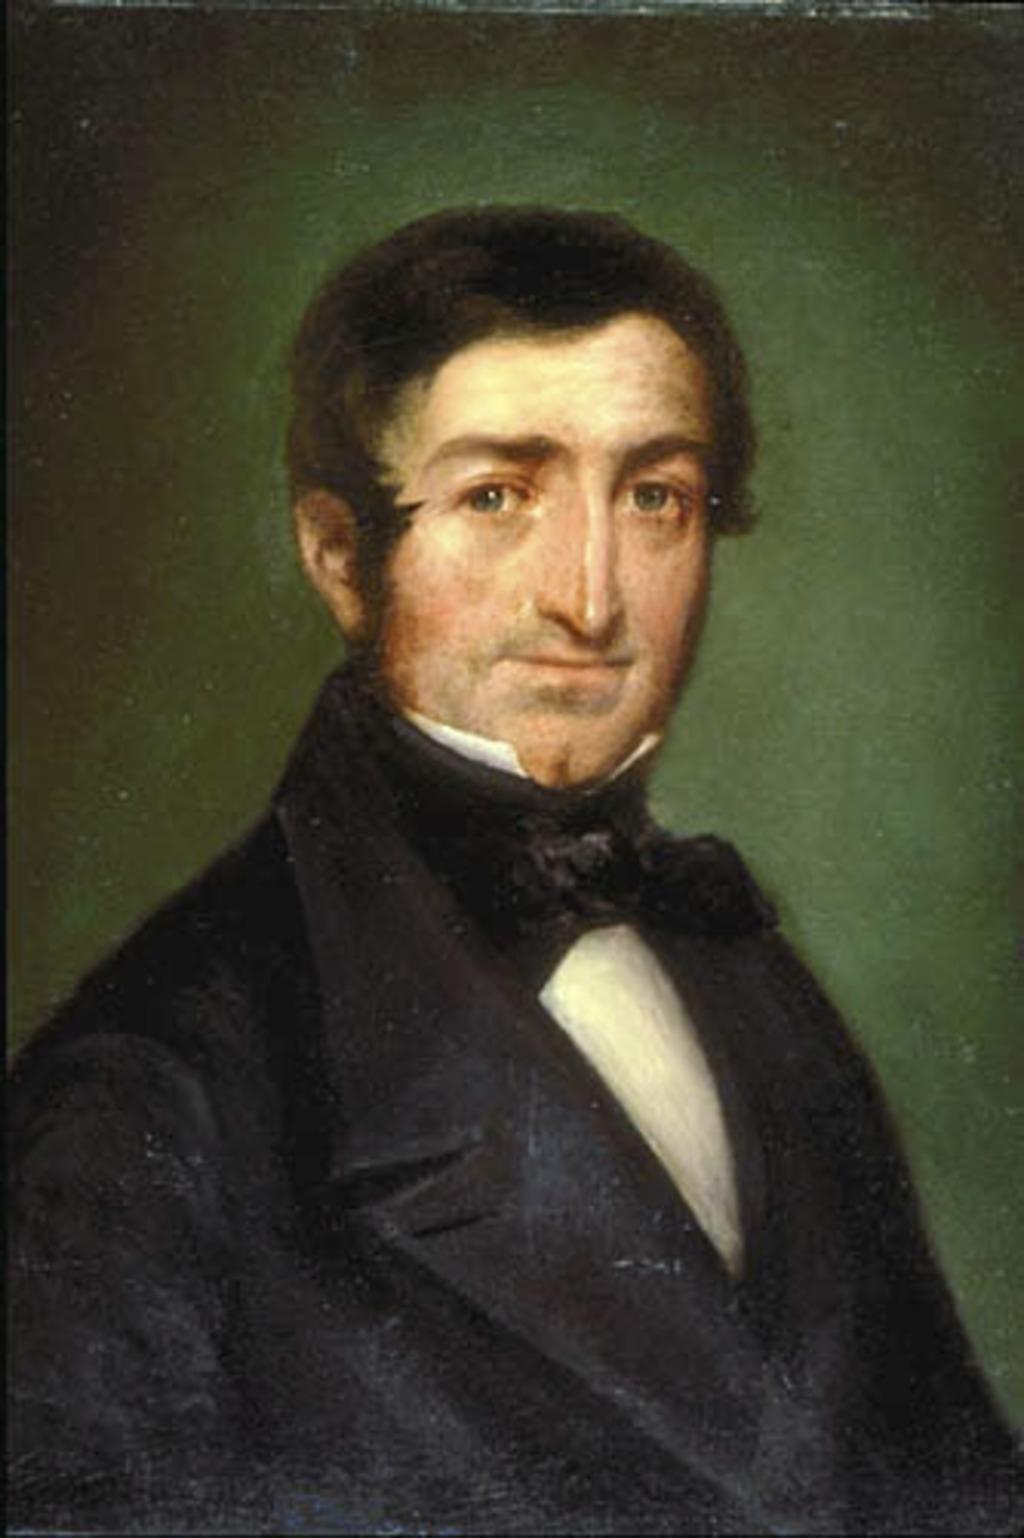 M. Langlois